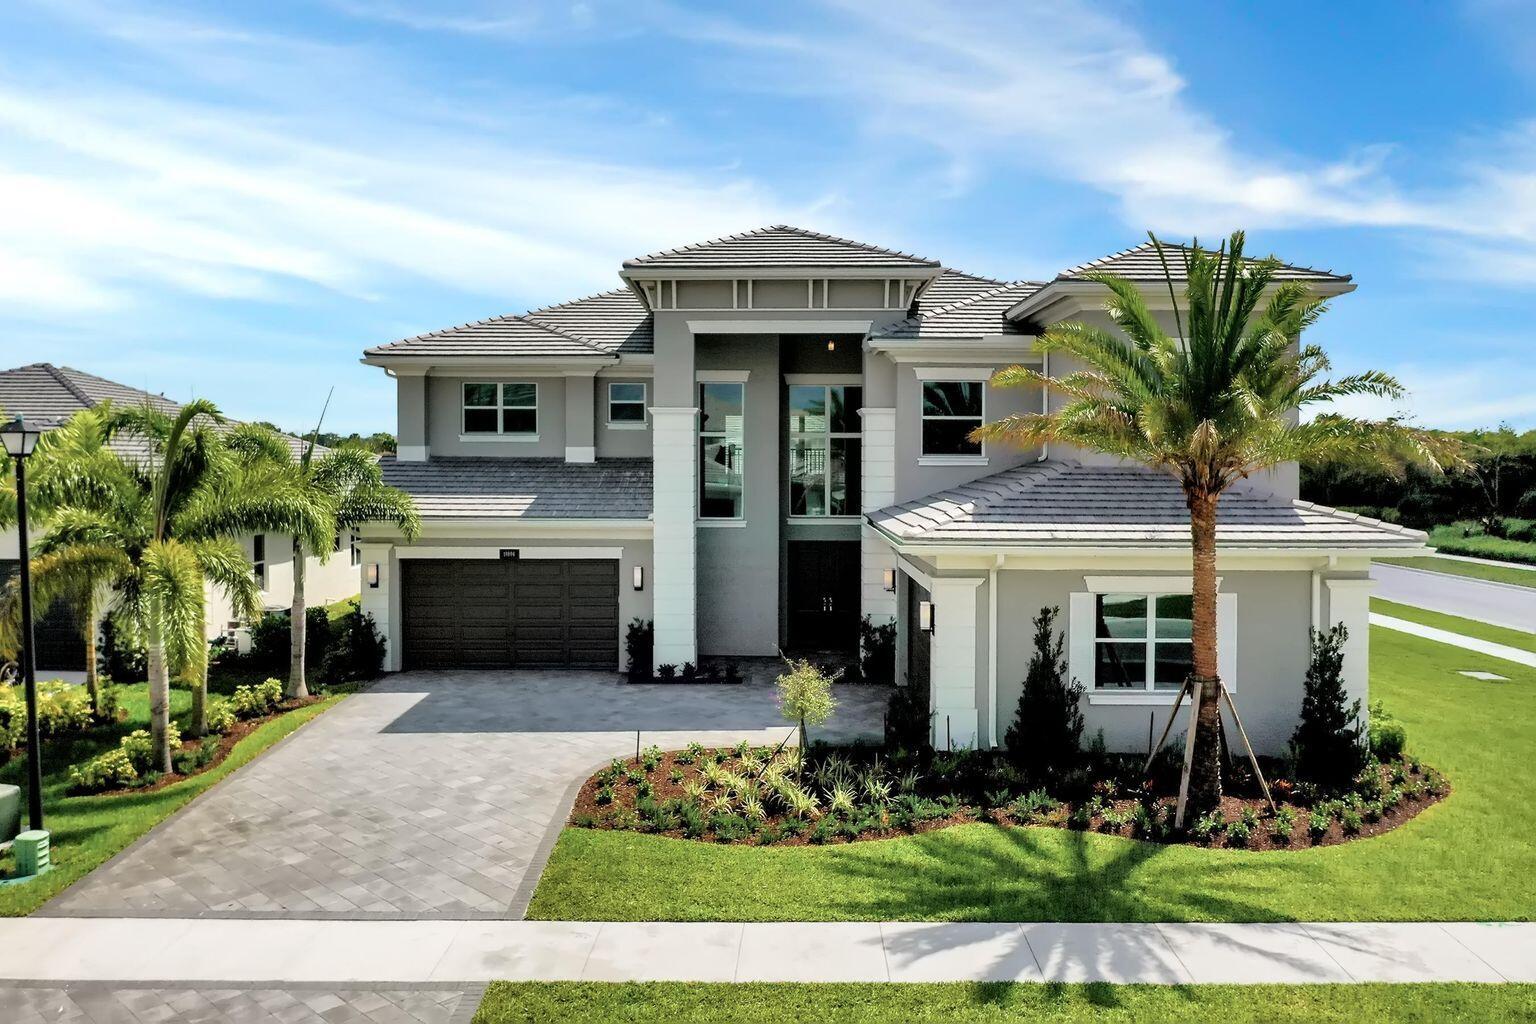 19894 Meadowside Lane Boca Raton, FL 33498